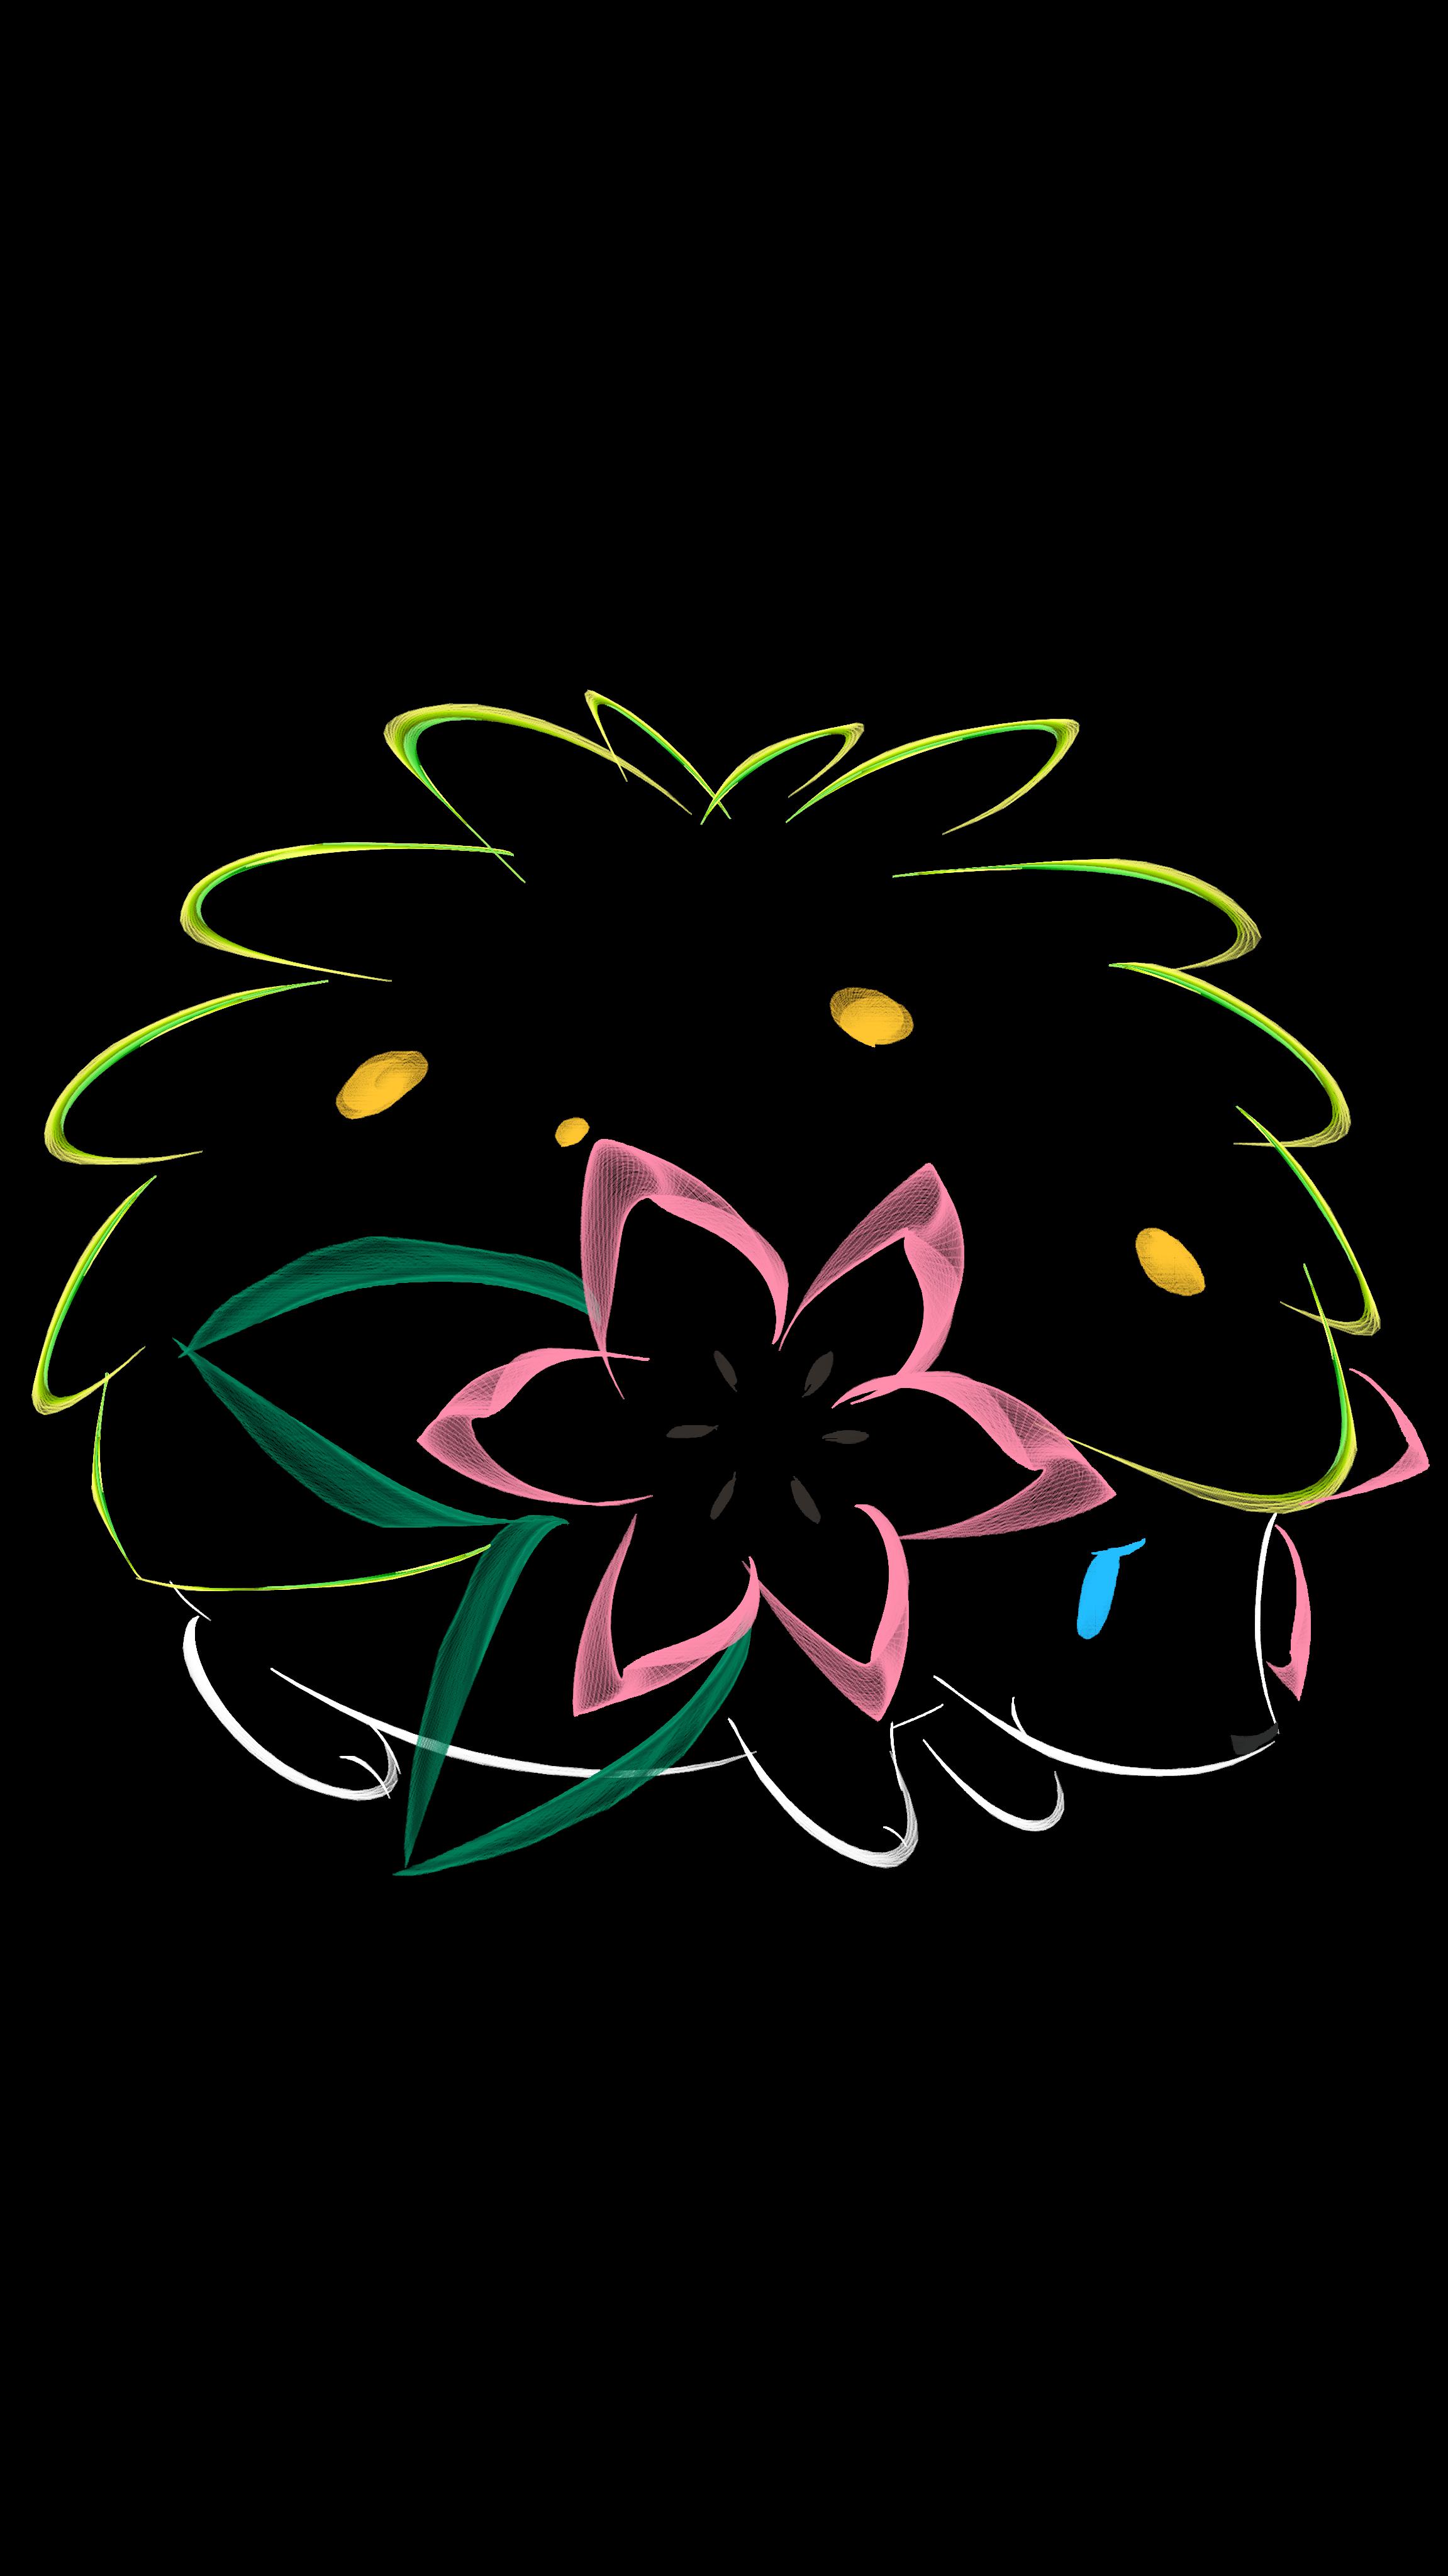 Flowpaperでランドフォルムシェイミ2 My Flowpaper Pokemon ポケモン